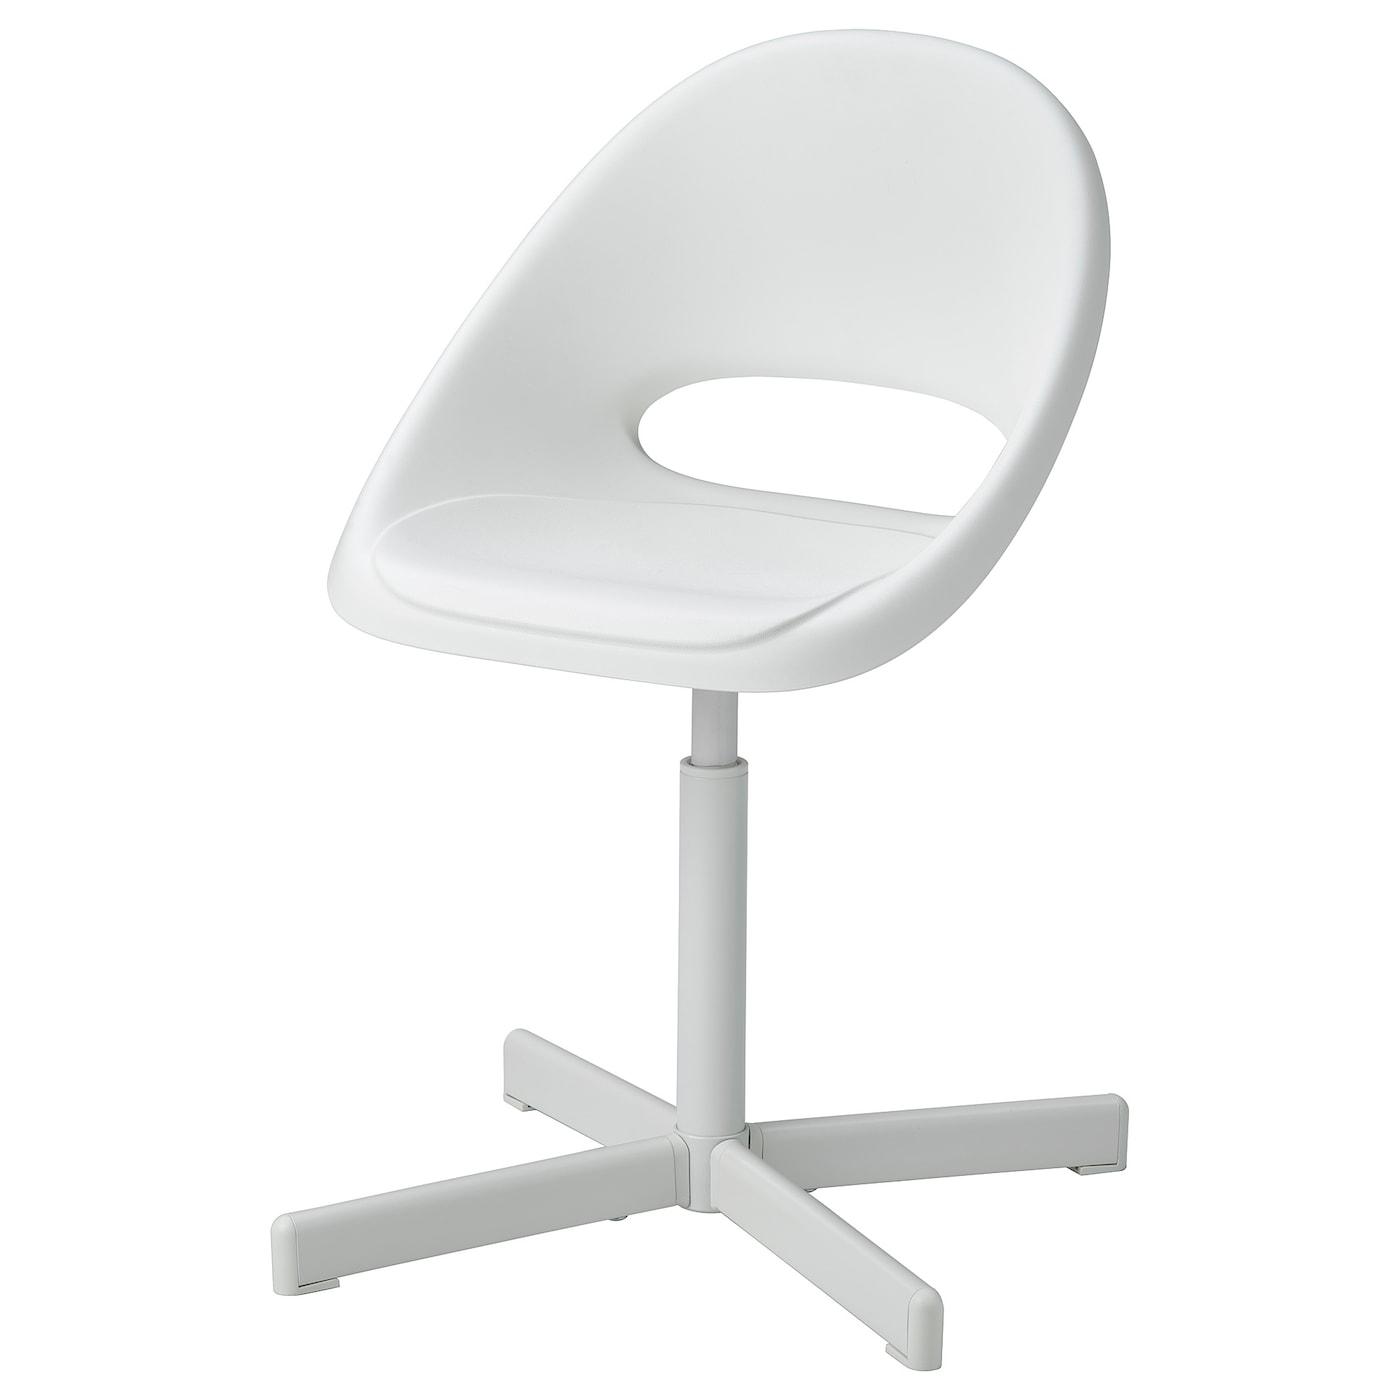 LOBERGET SIBBEN Kinderbureaustoel, wit IKEA